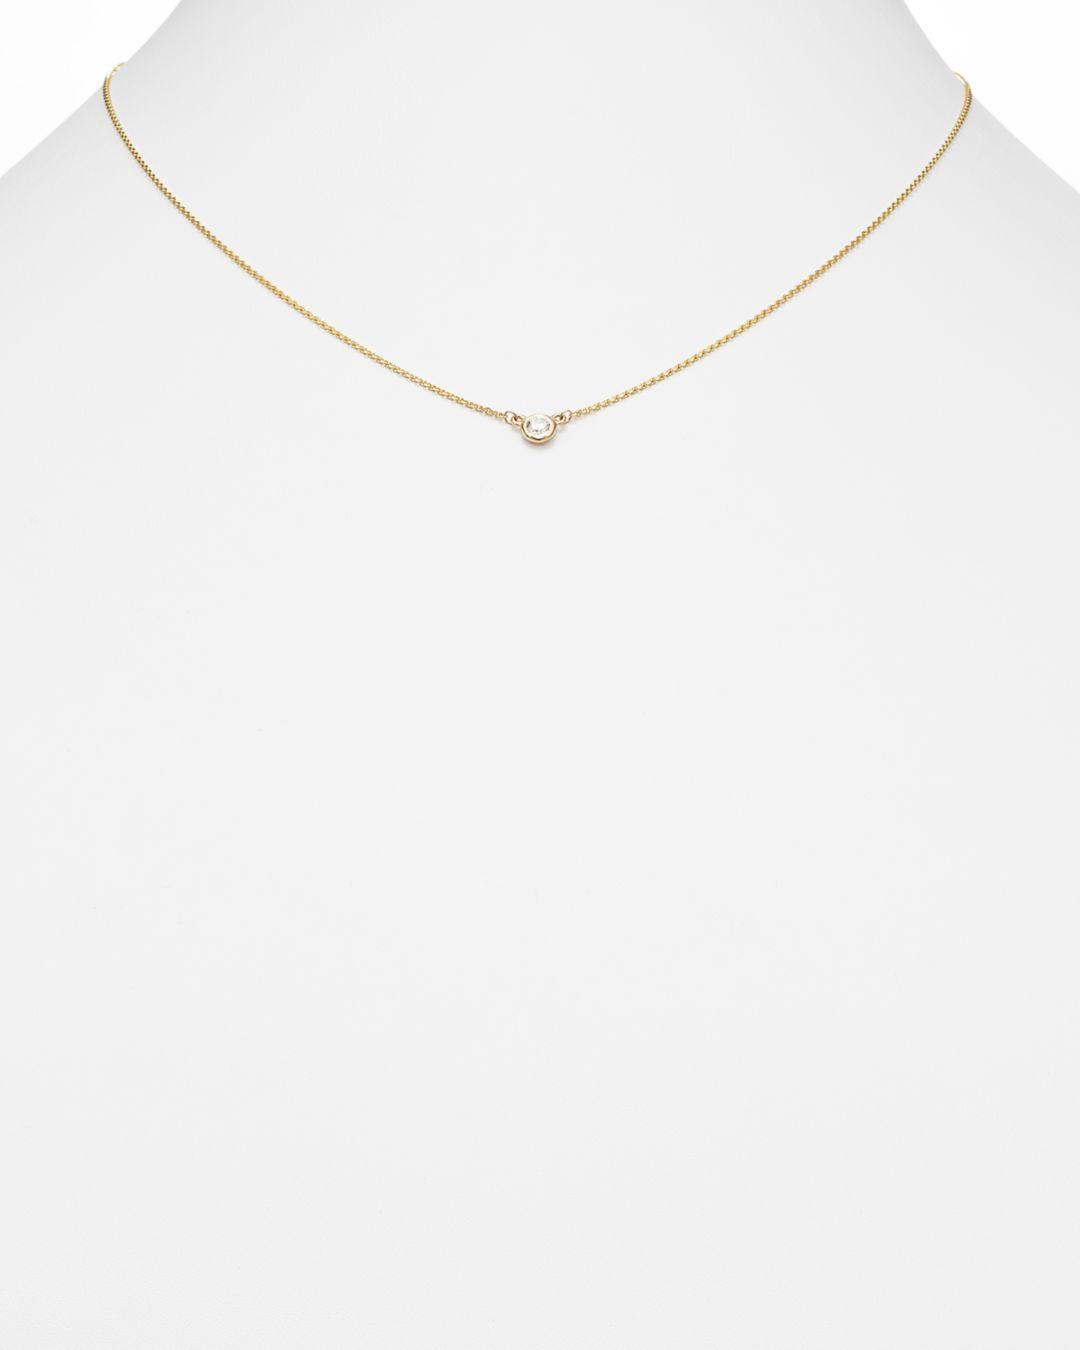 Bloomingdale's Diamond Bezel Set Pendant Necklace In 14k Yellow Gold in White/Gold (Metallic)